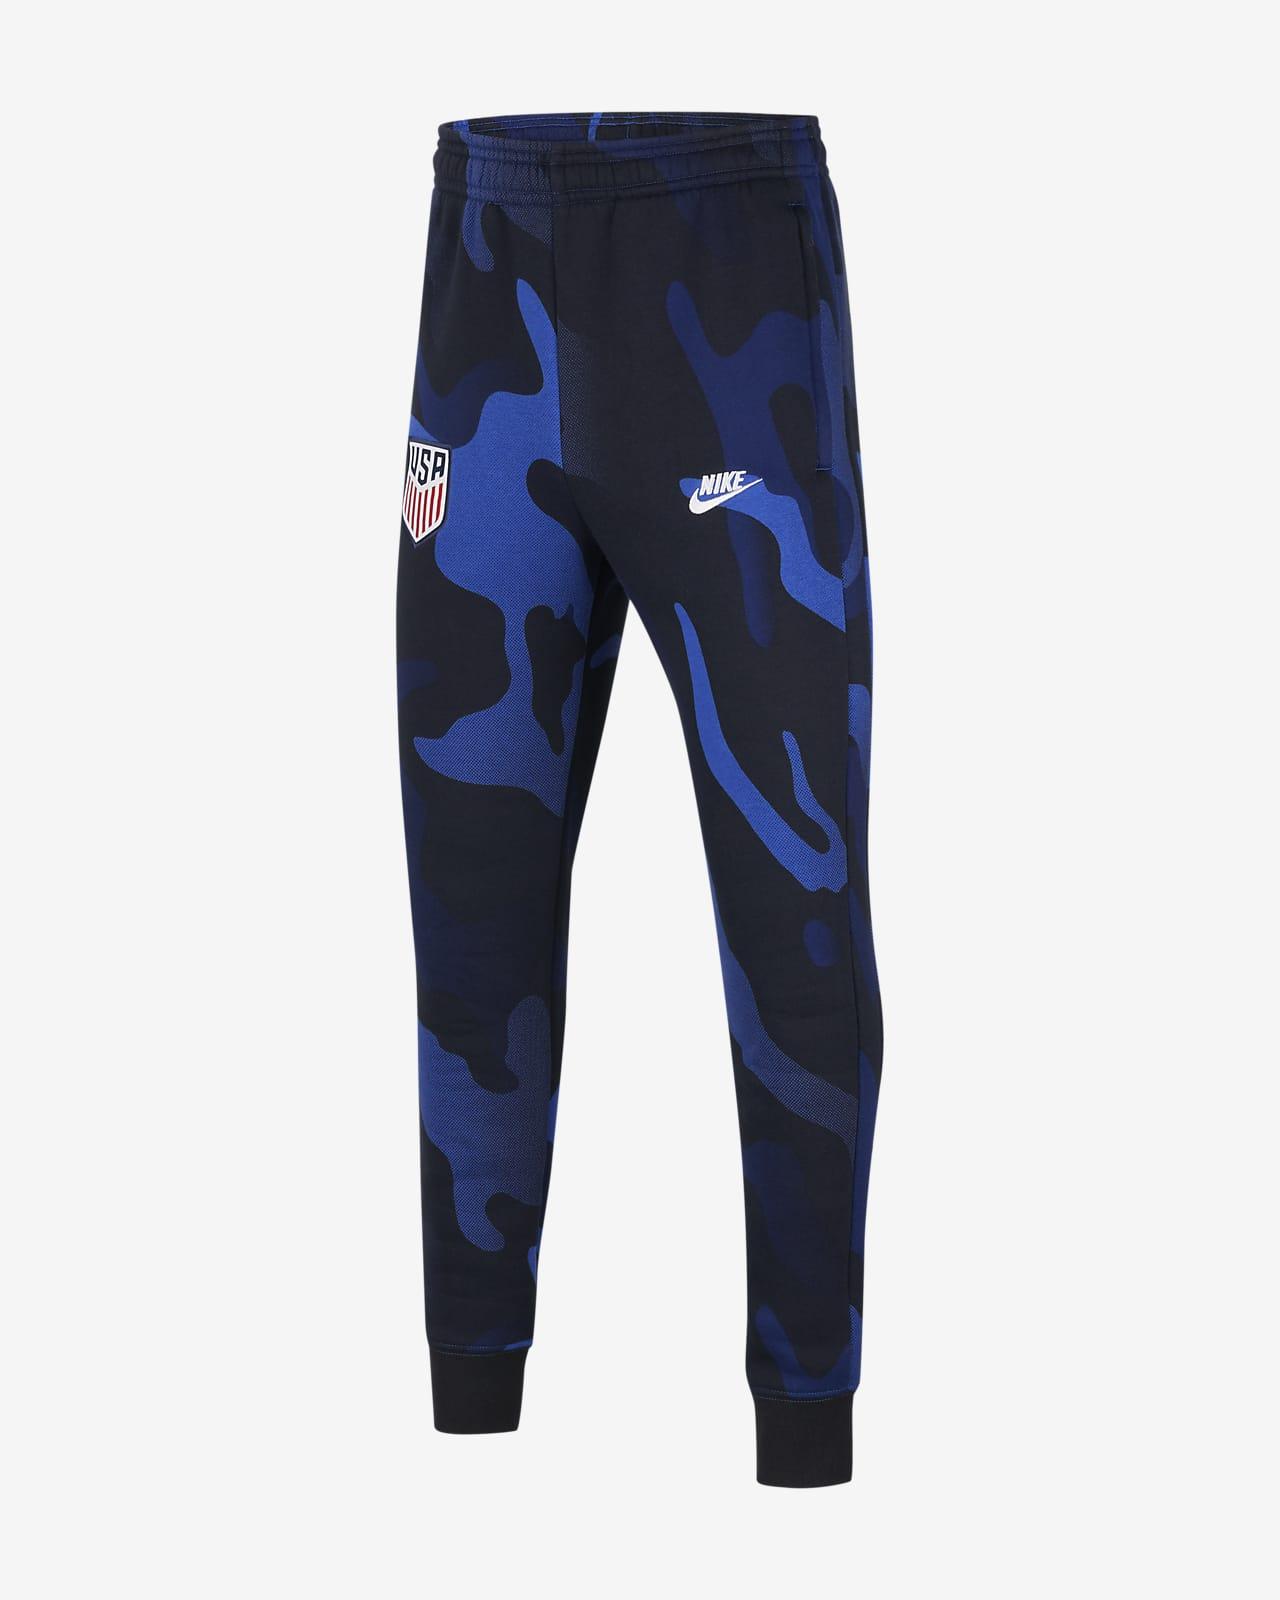 U.S. Big Kids' Fleece Soccer Pants